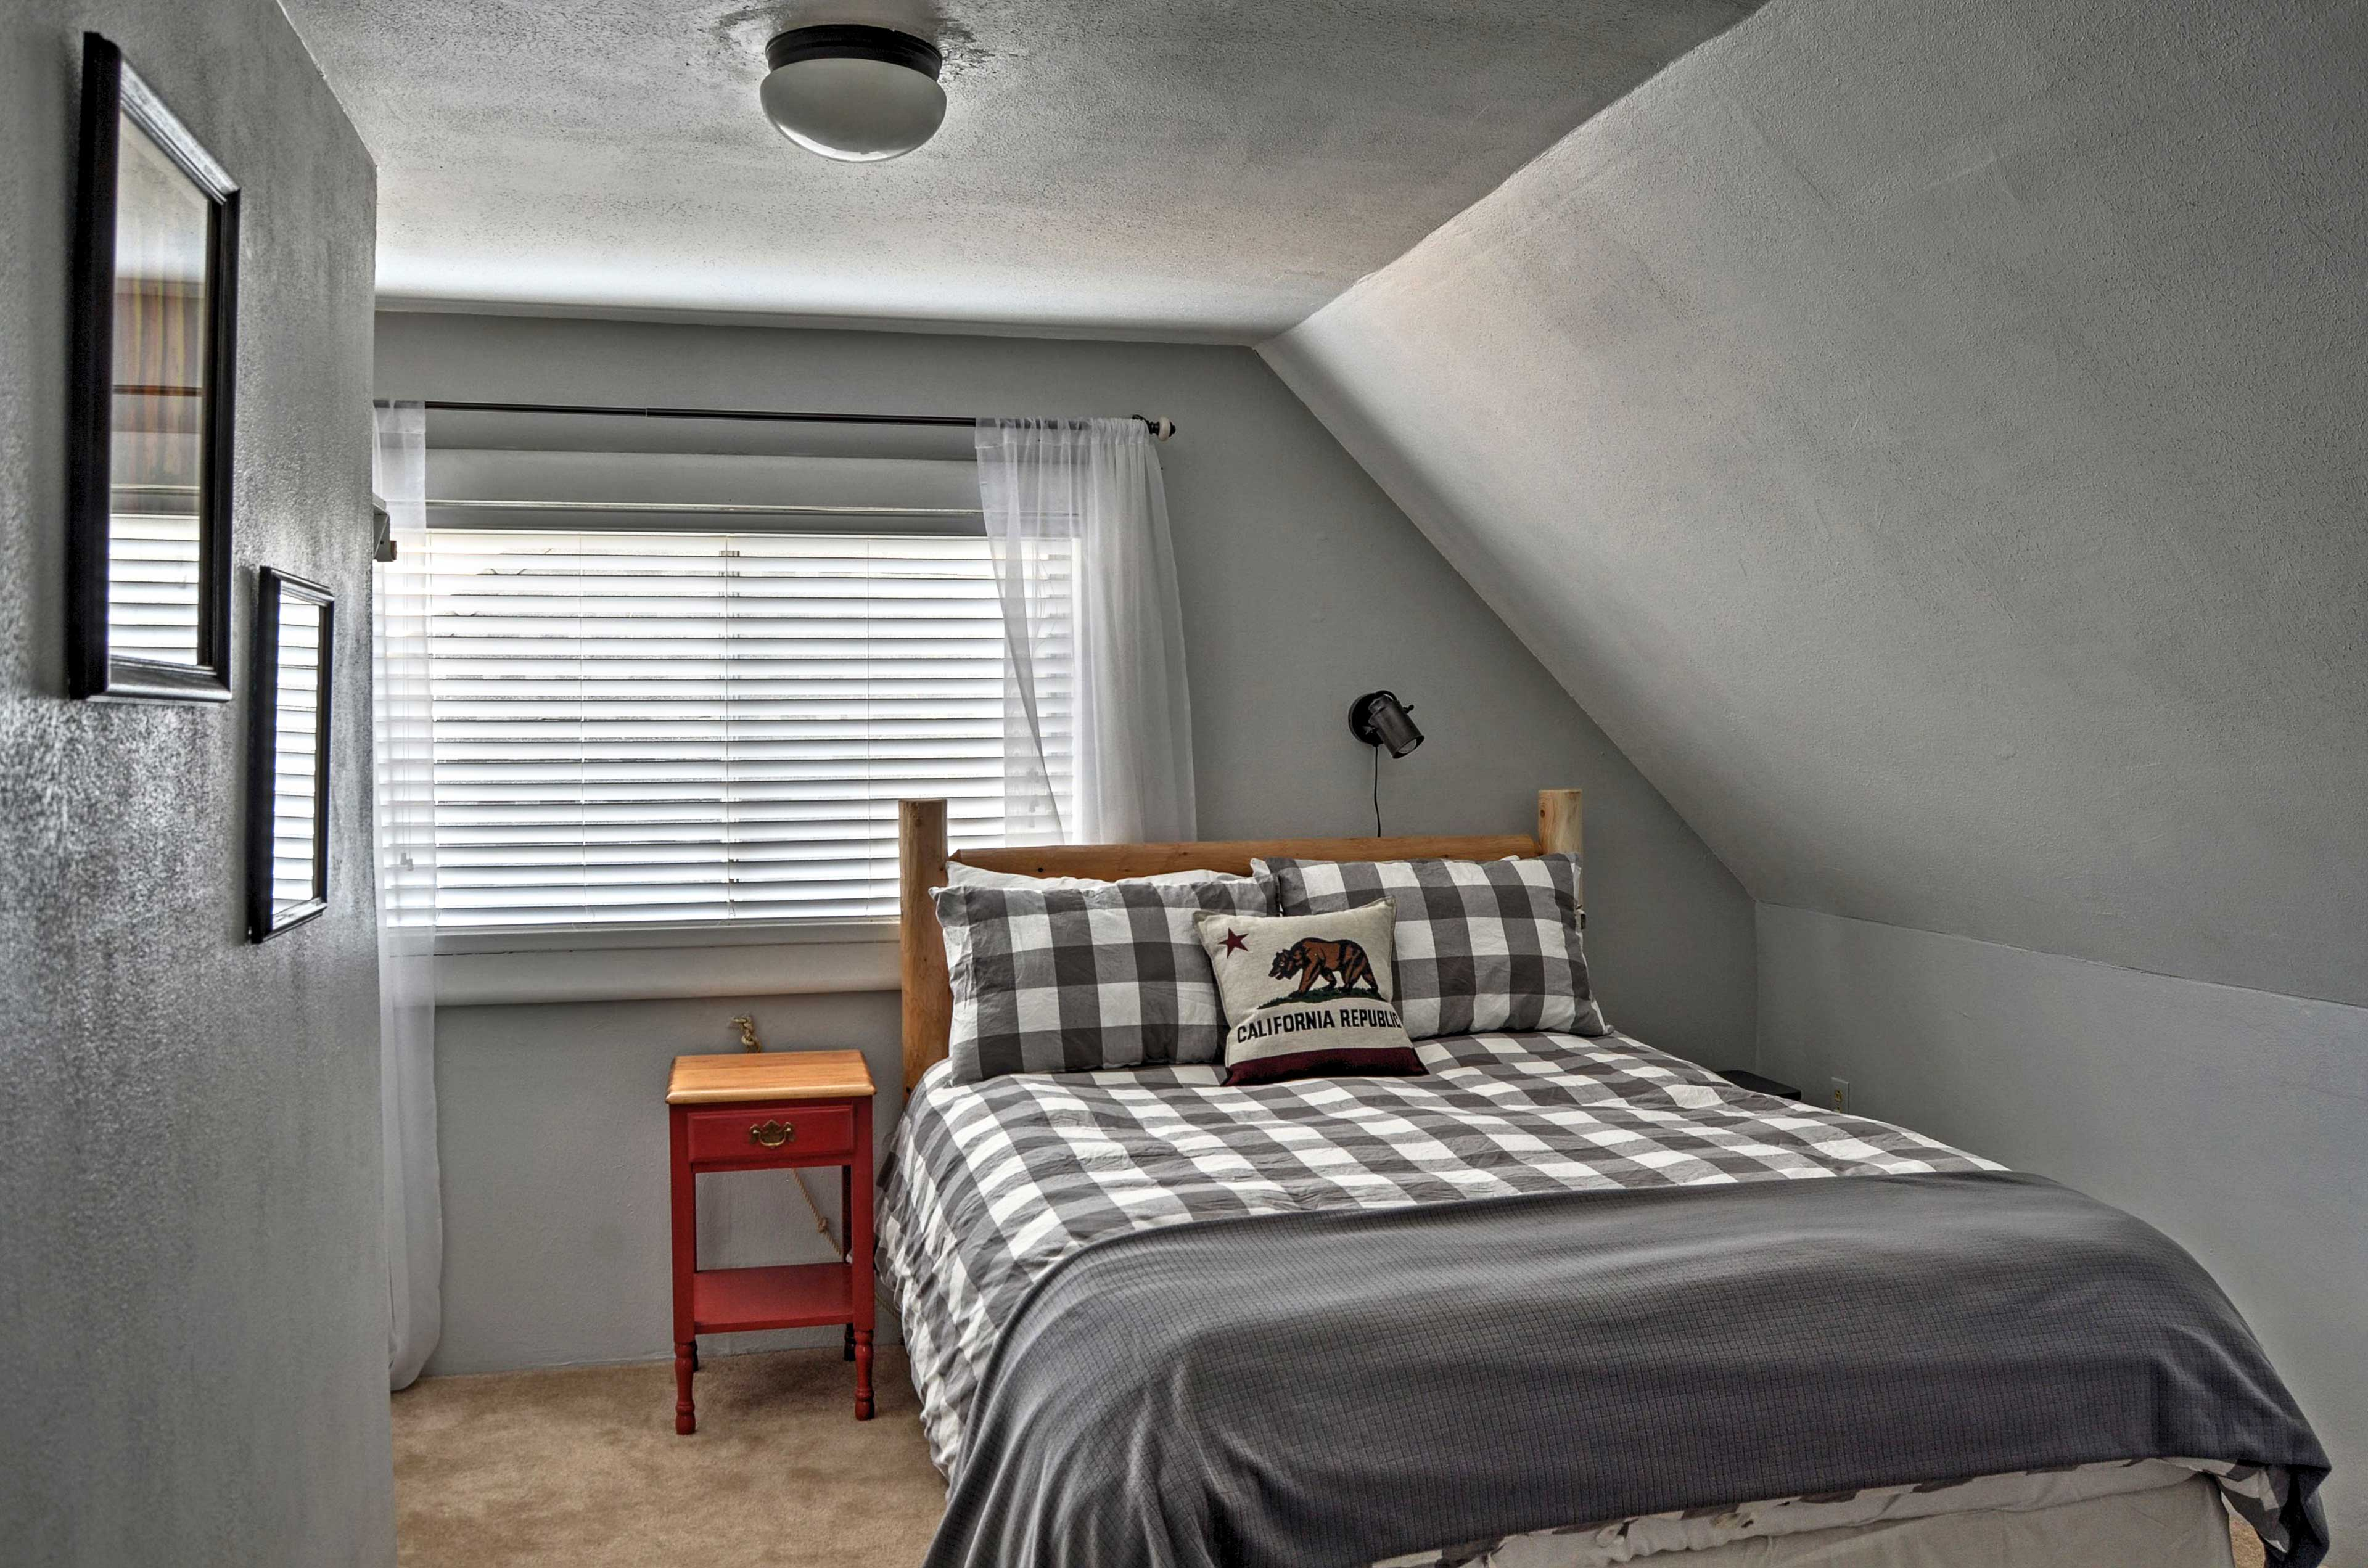 The master bedroom hosts a queen bed.